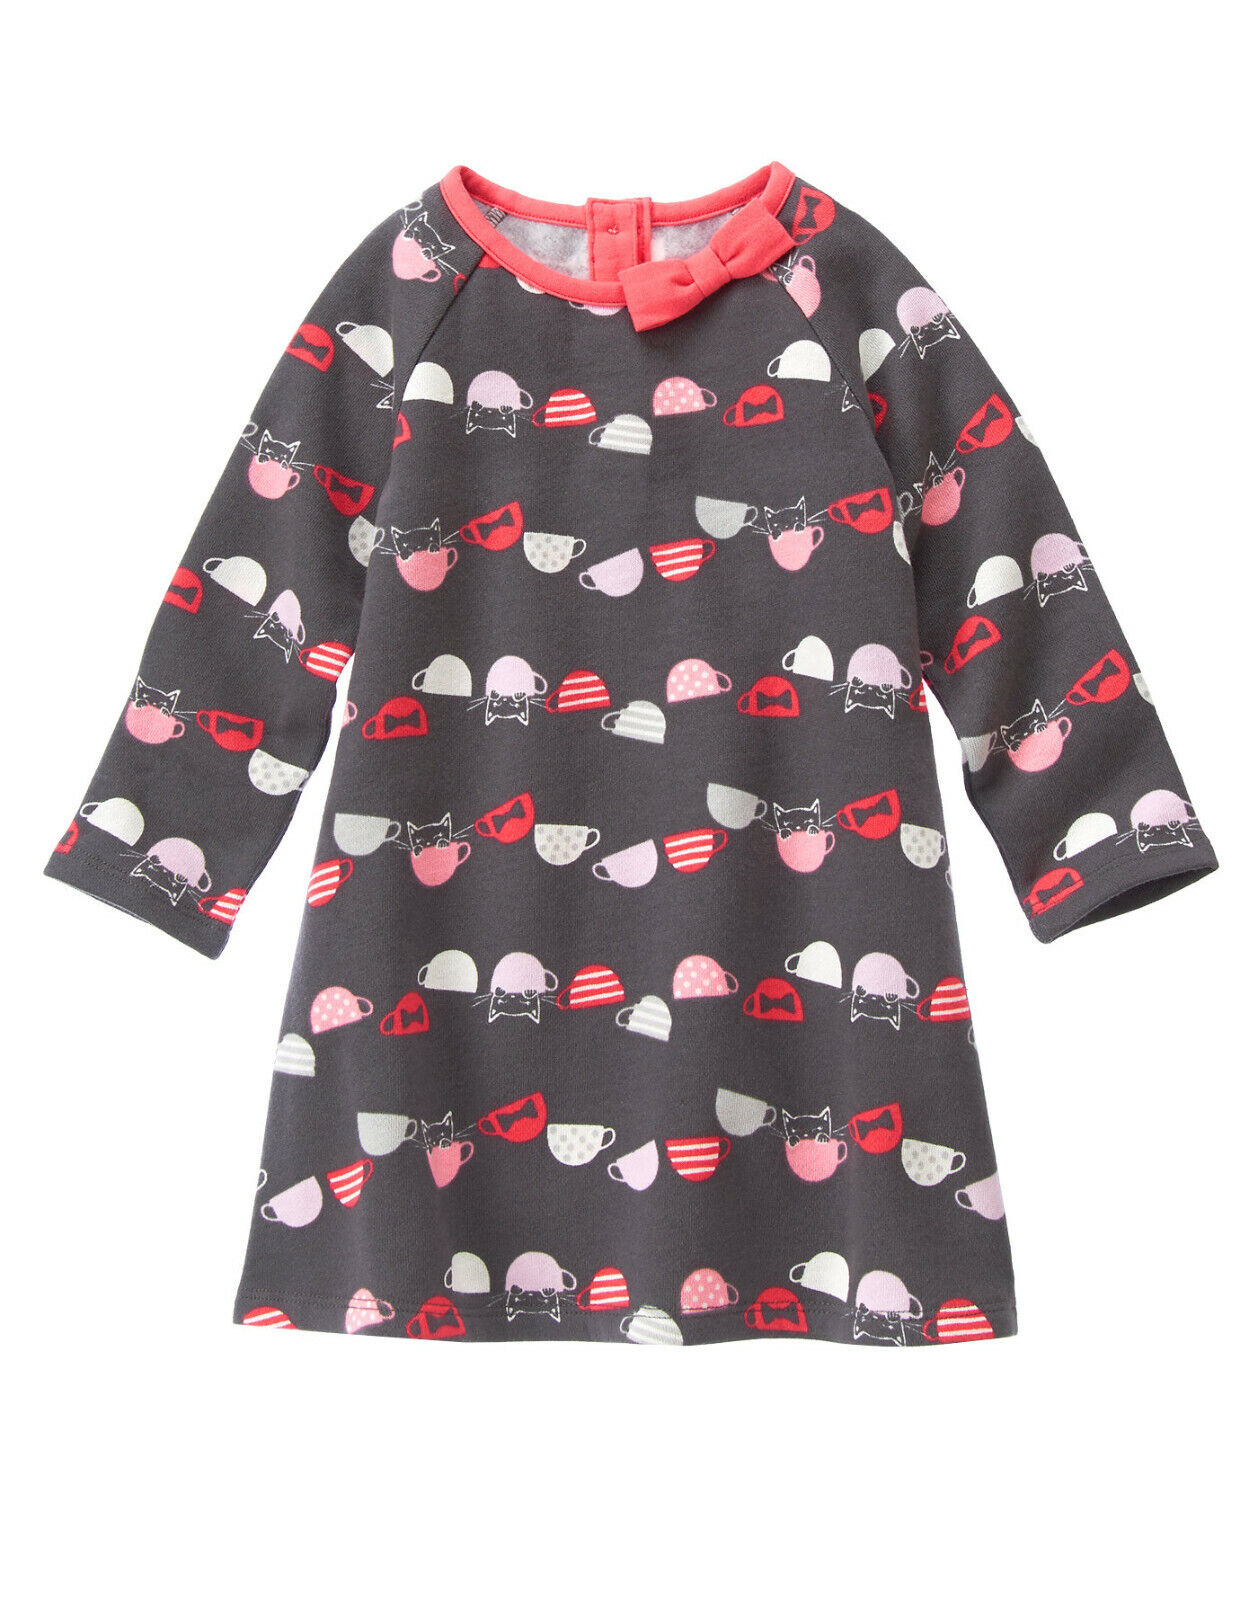 NWT Gymboree Kitty Cat Teacup Print Sweatshirt Dress 18-24 M